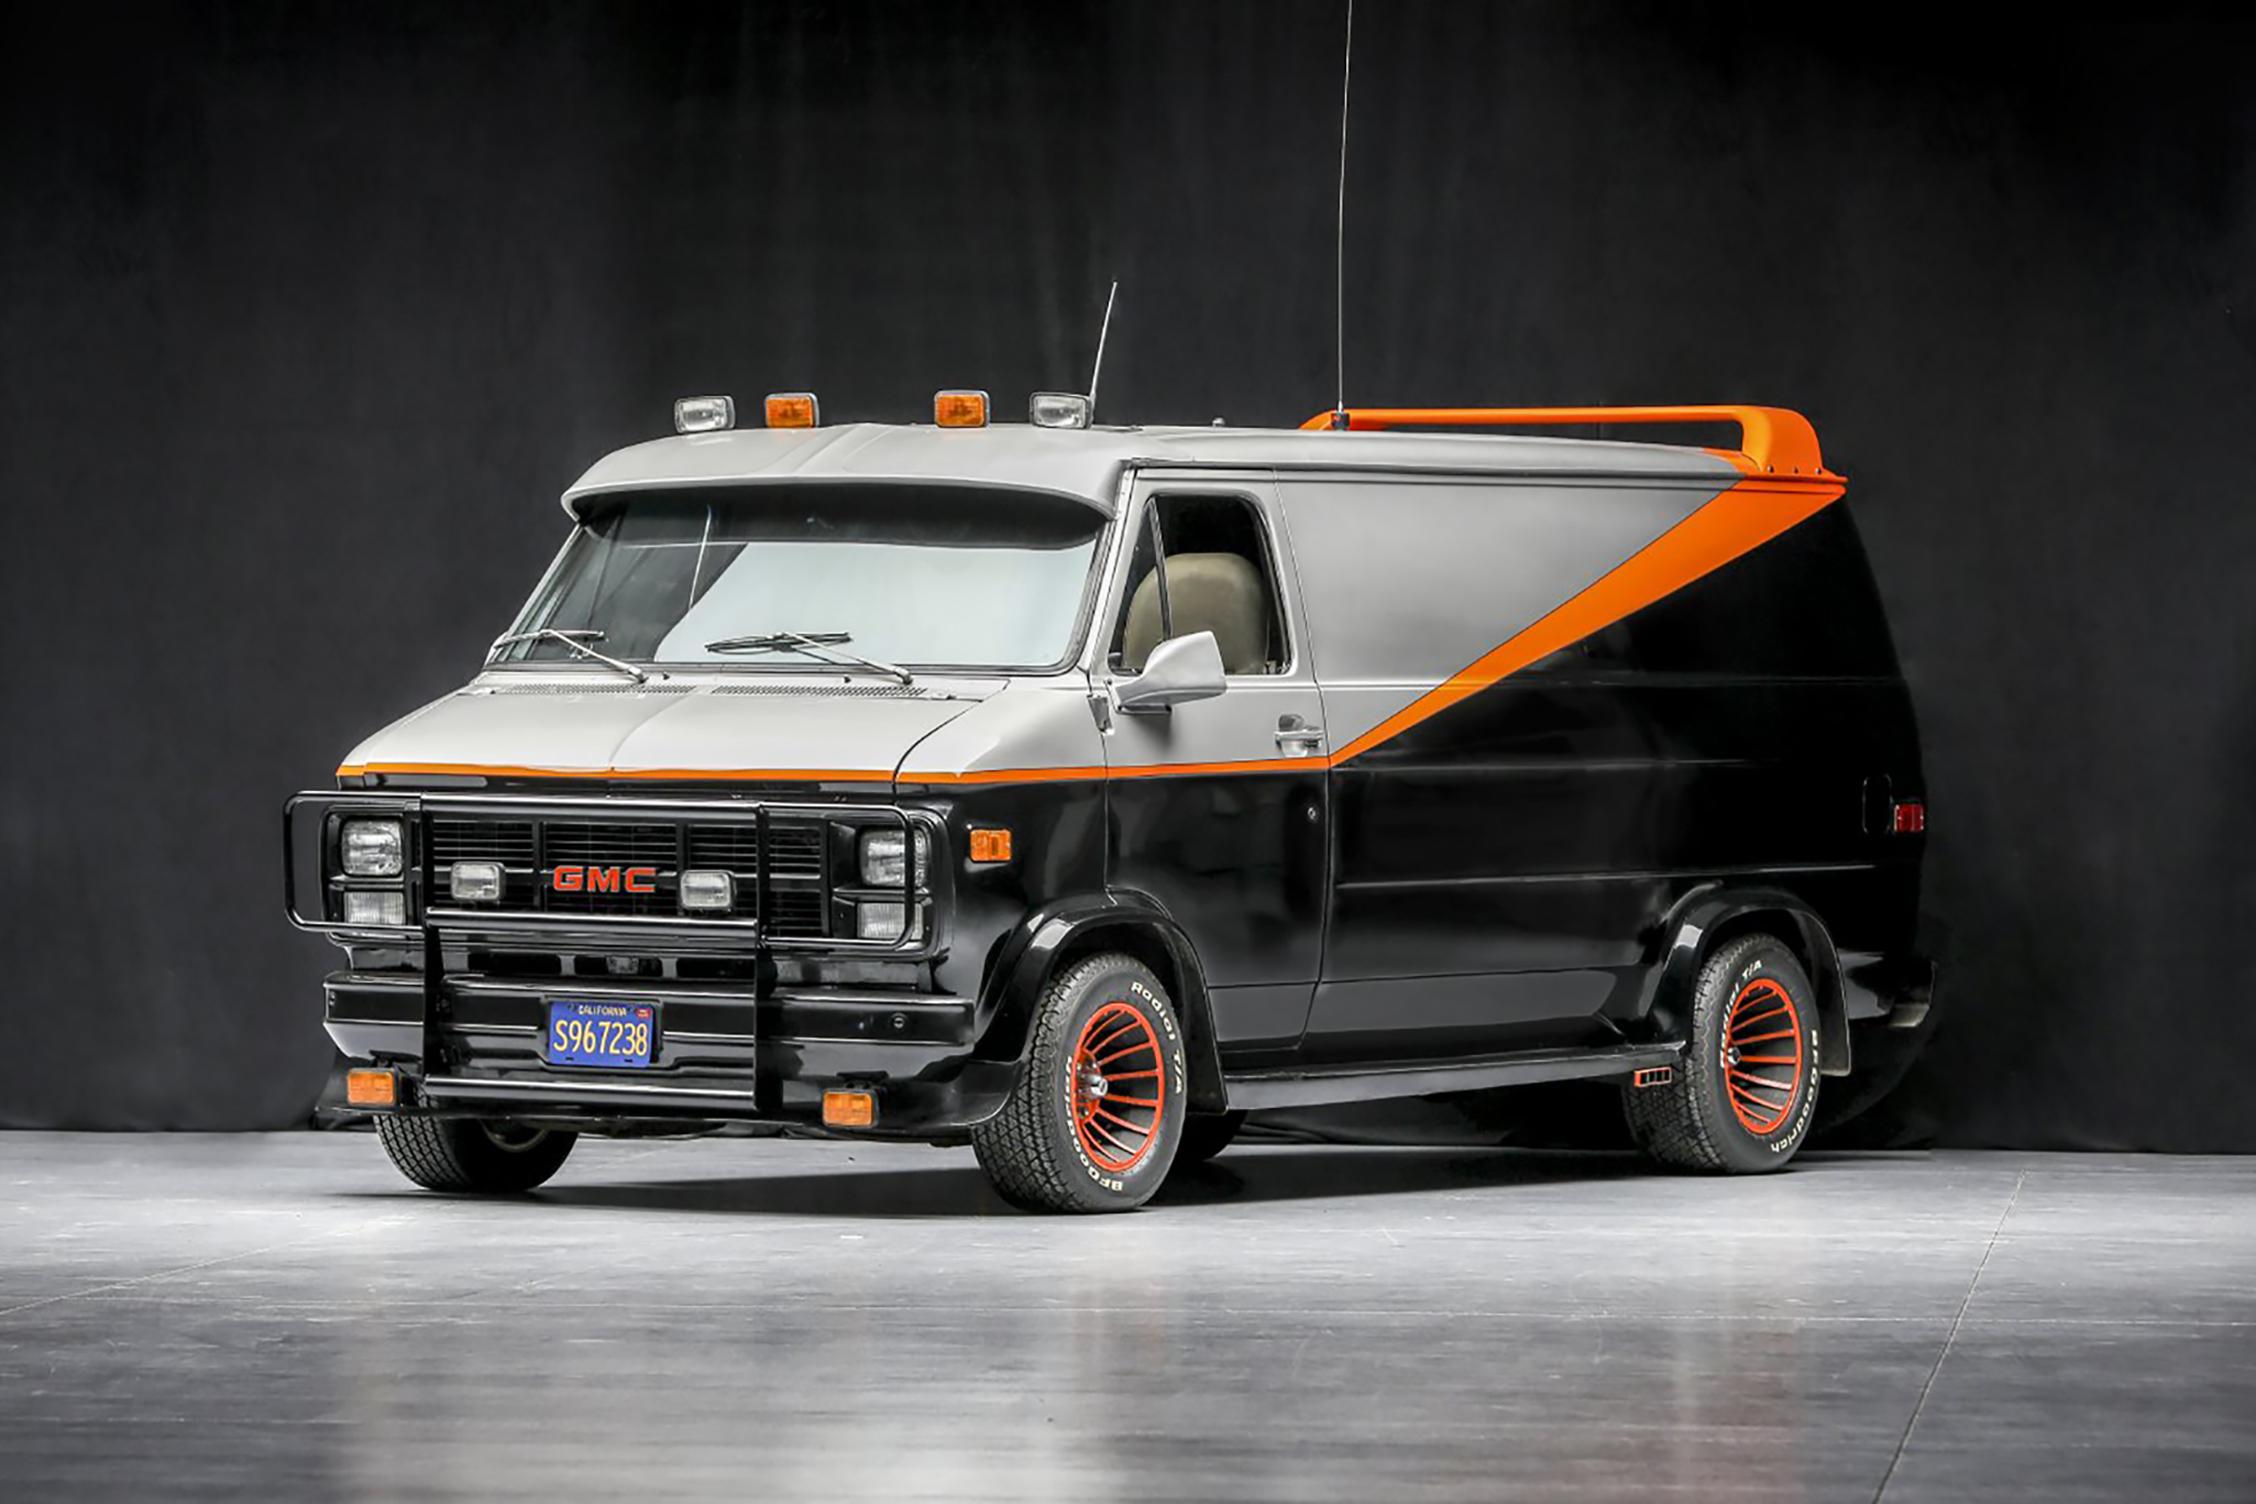 A-Team Van auction